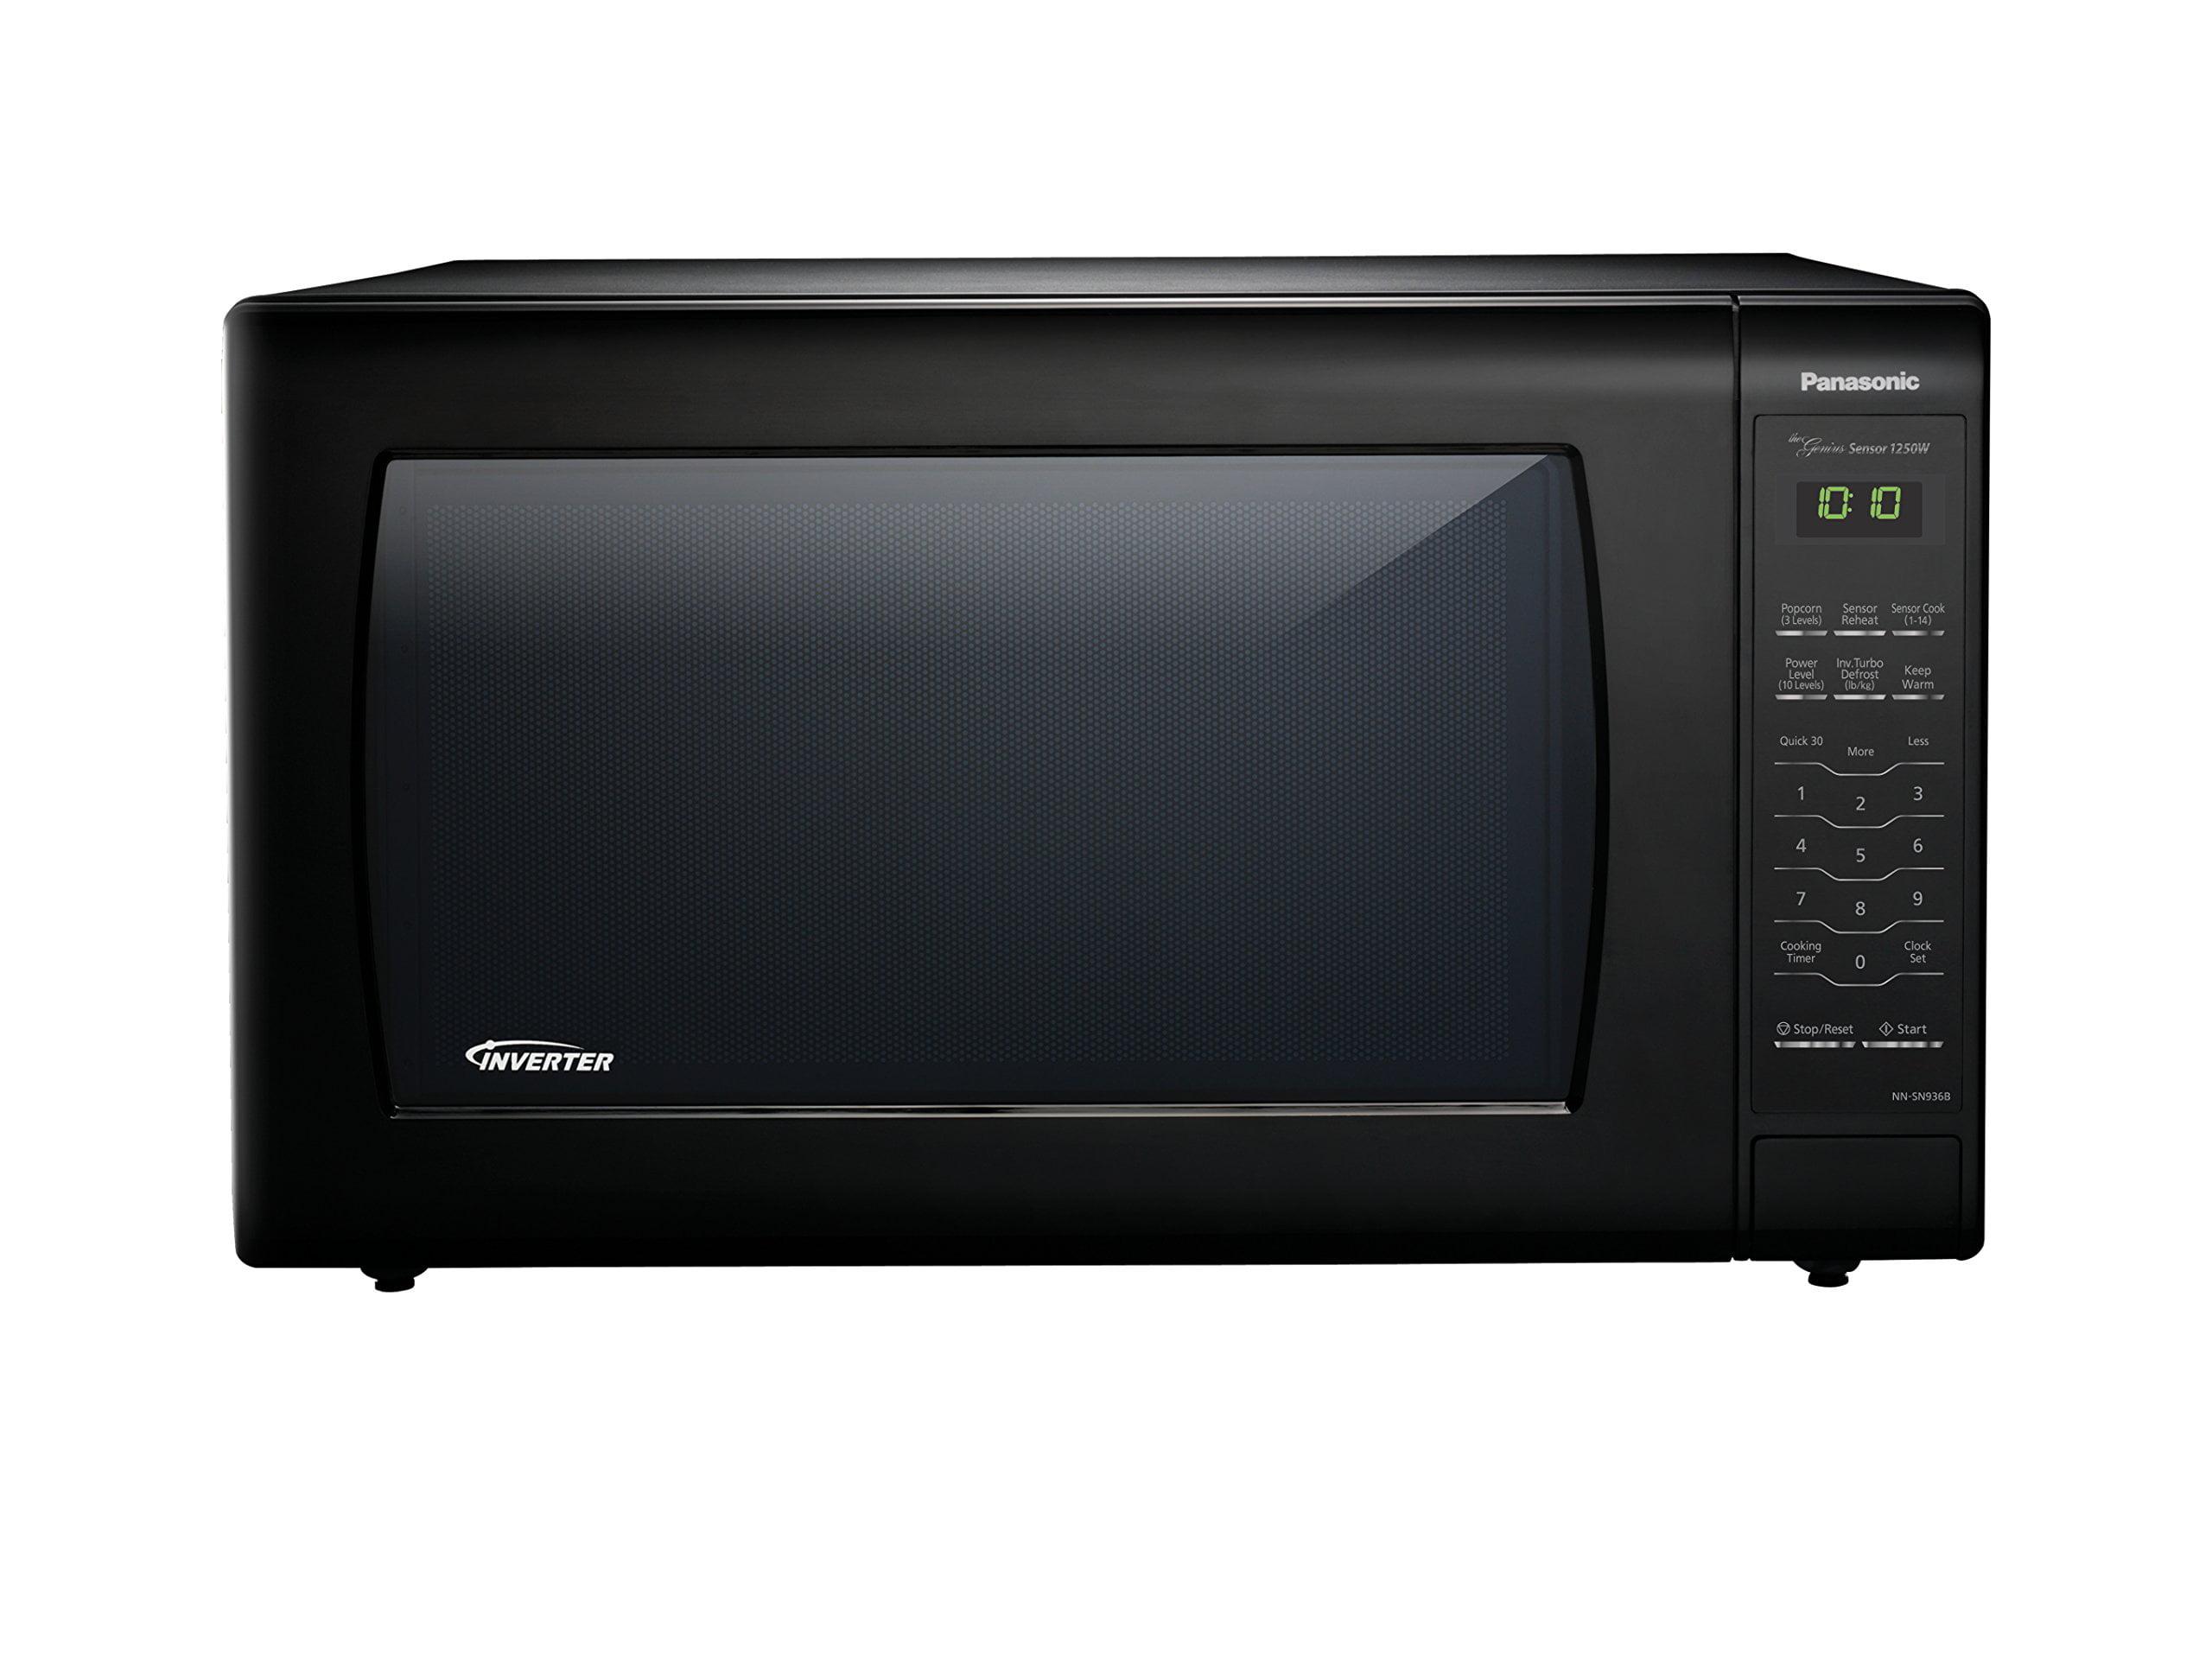 Panasonic Genius Nn Su696s Microwave Oven Price Tracking